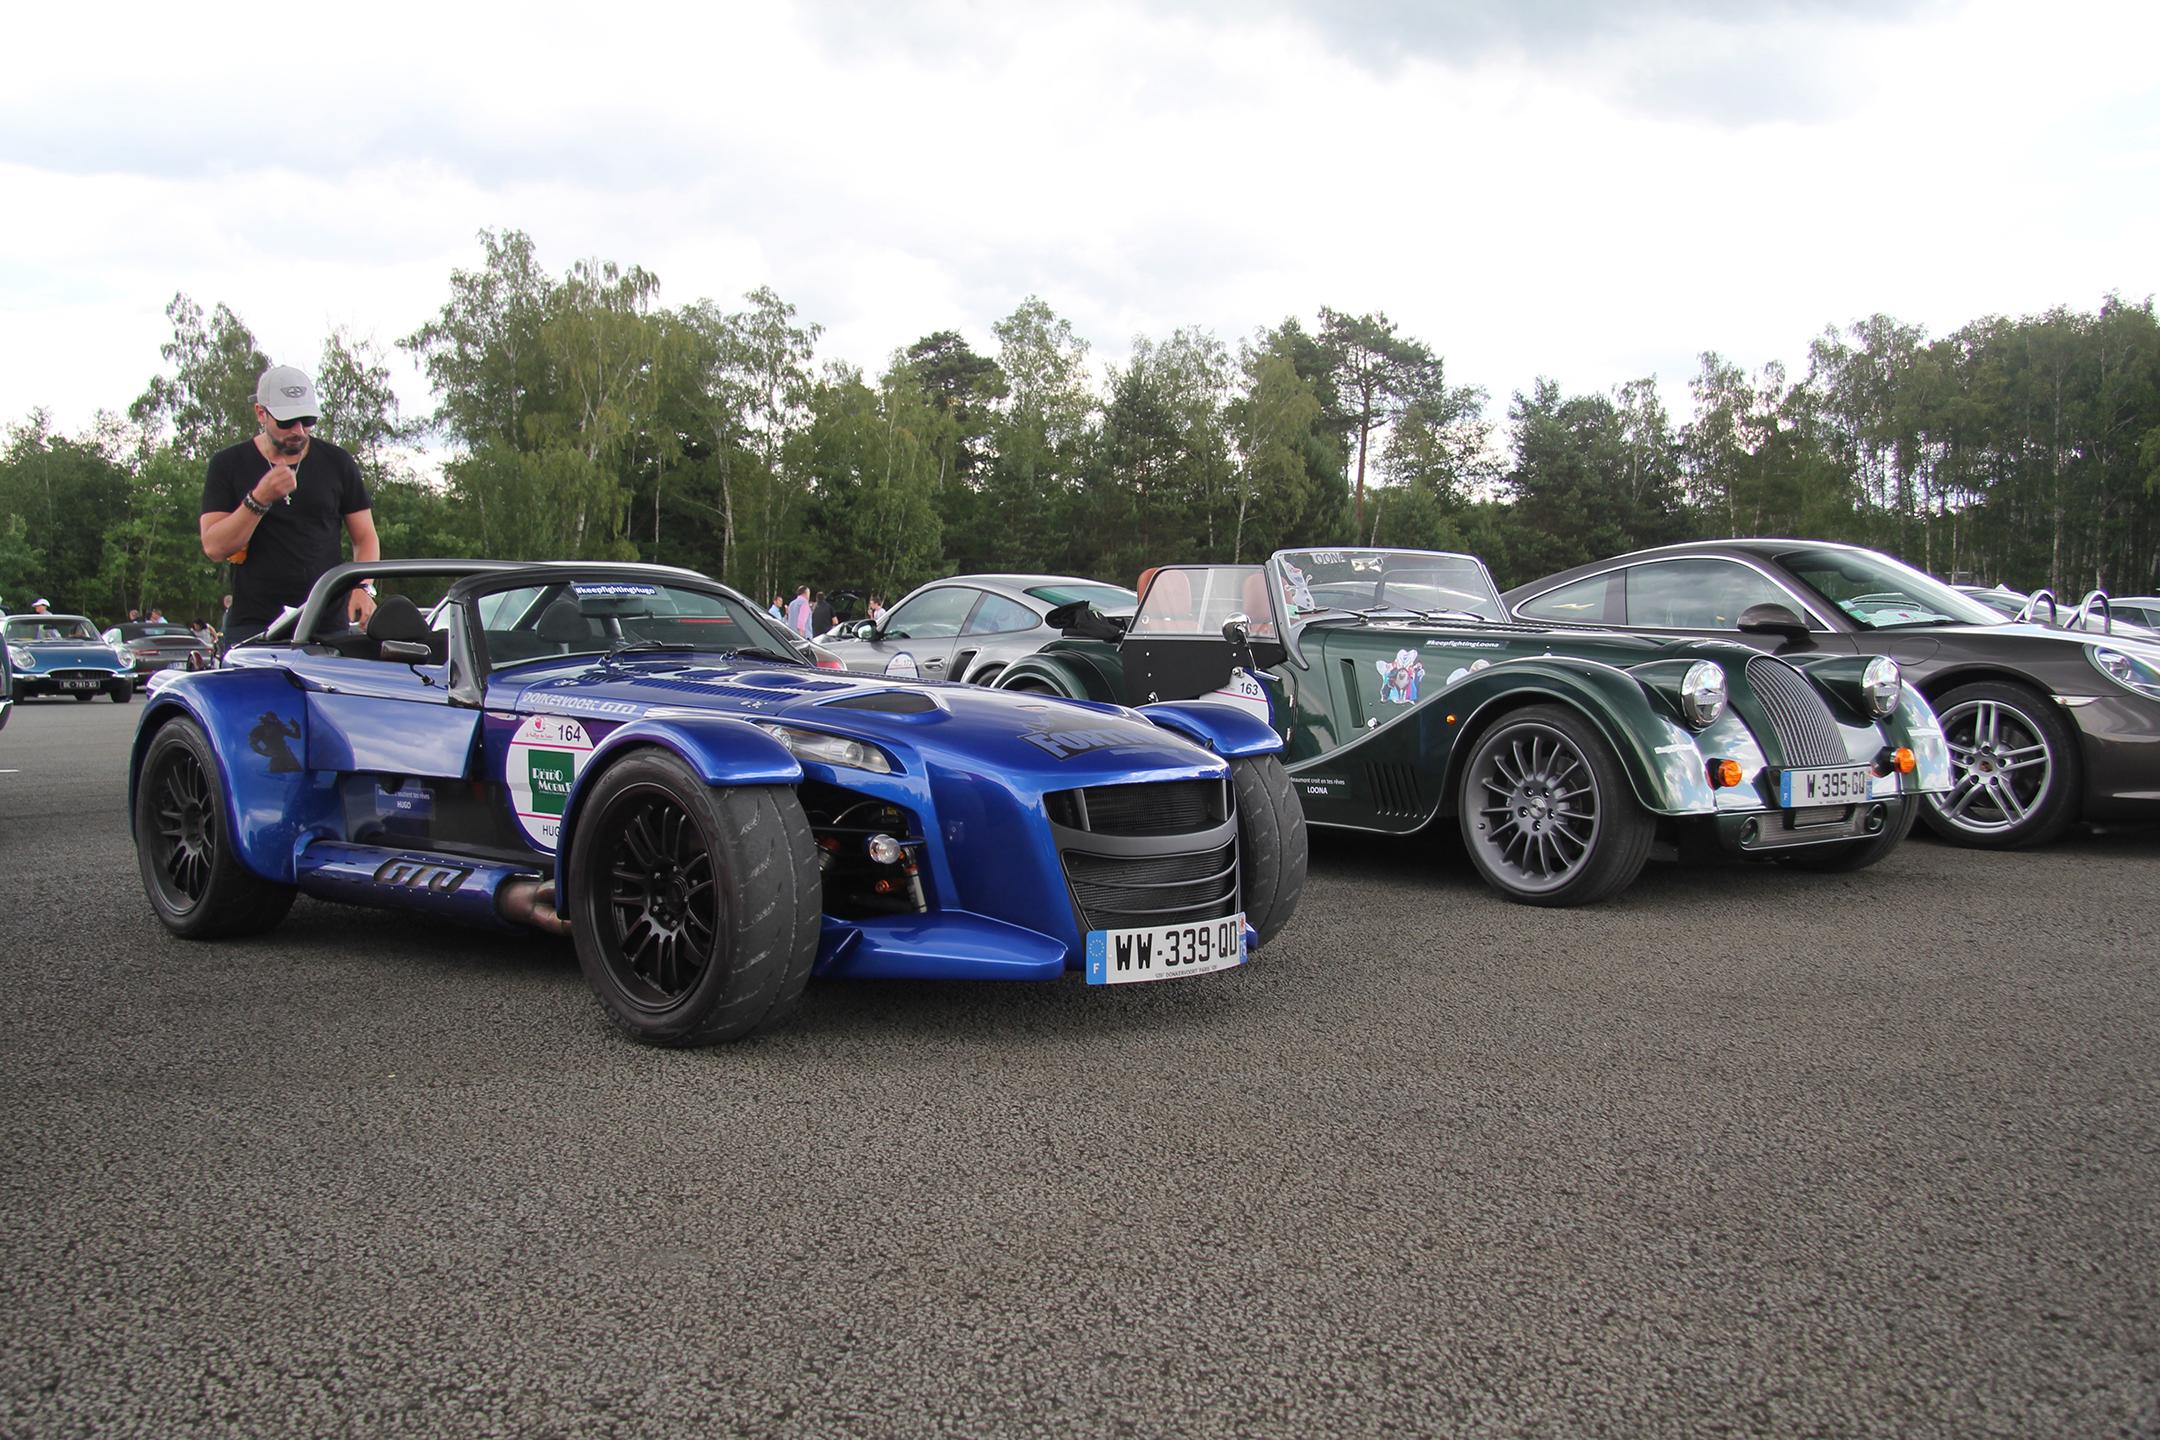 Donkervoort GTO - Rallye du Coeur 2020 - photo Ludo Ferrari